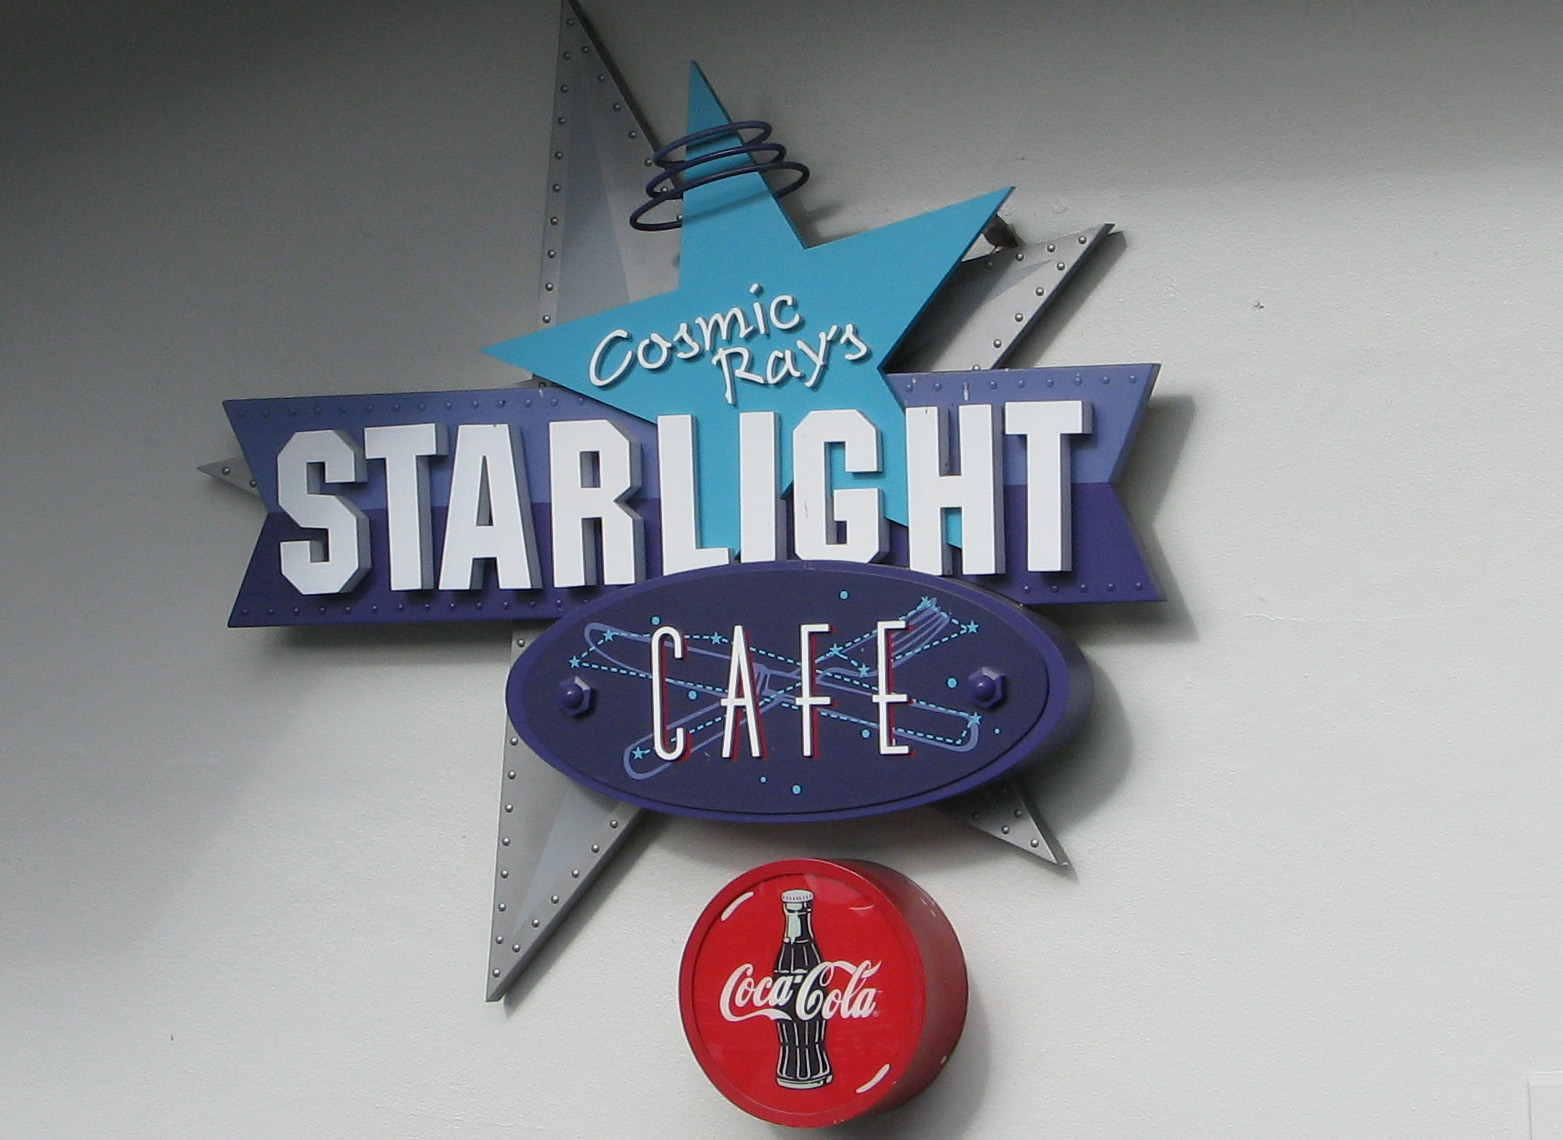 Cosmic Rays Starlight Cafe.jpg